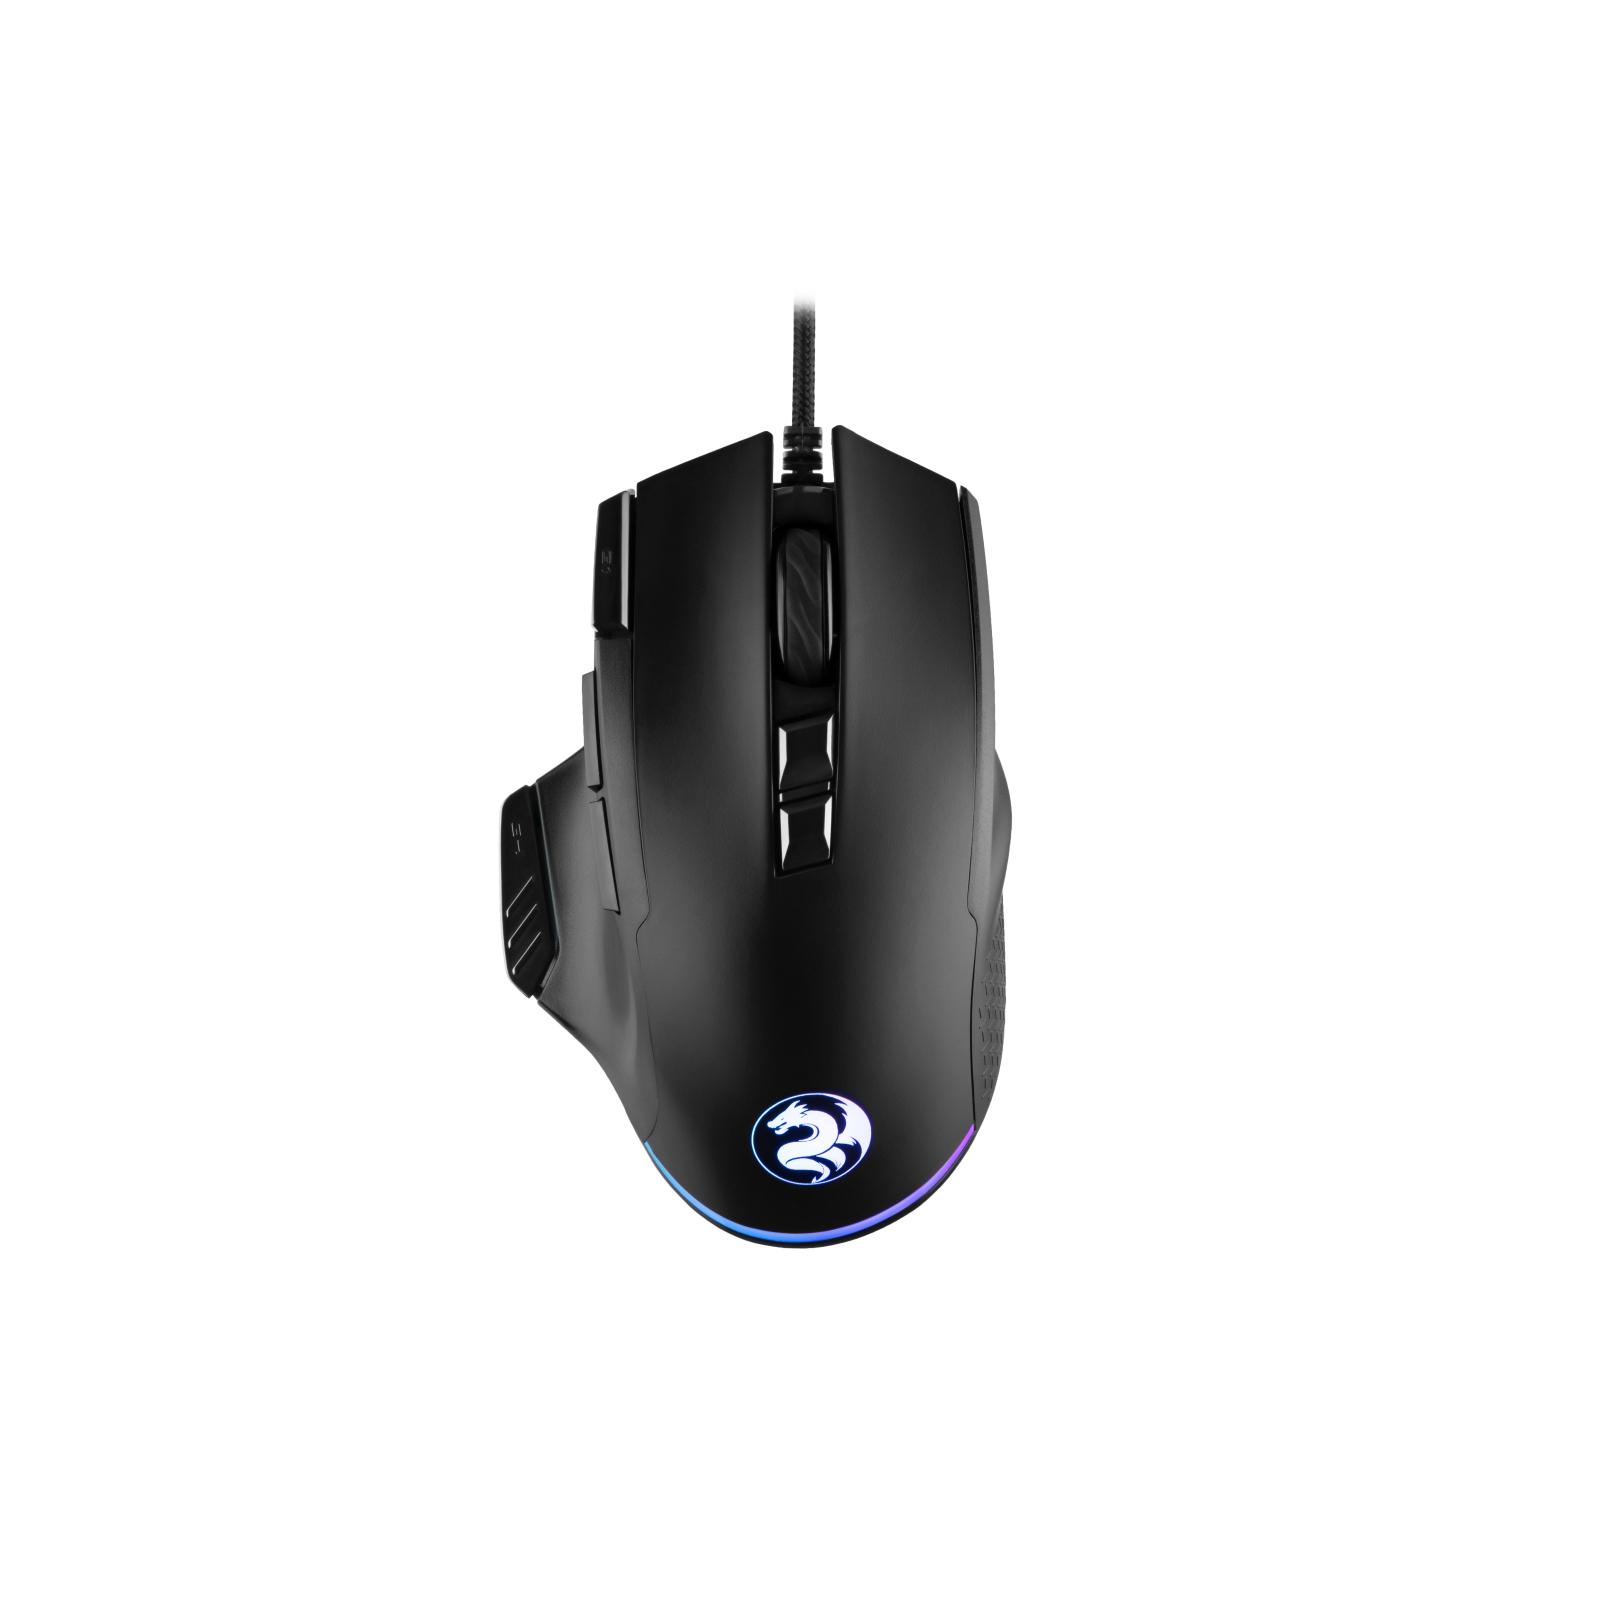 Мишка 2E MG330 RGB USB Black (2E-MG330UB)